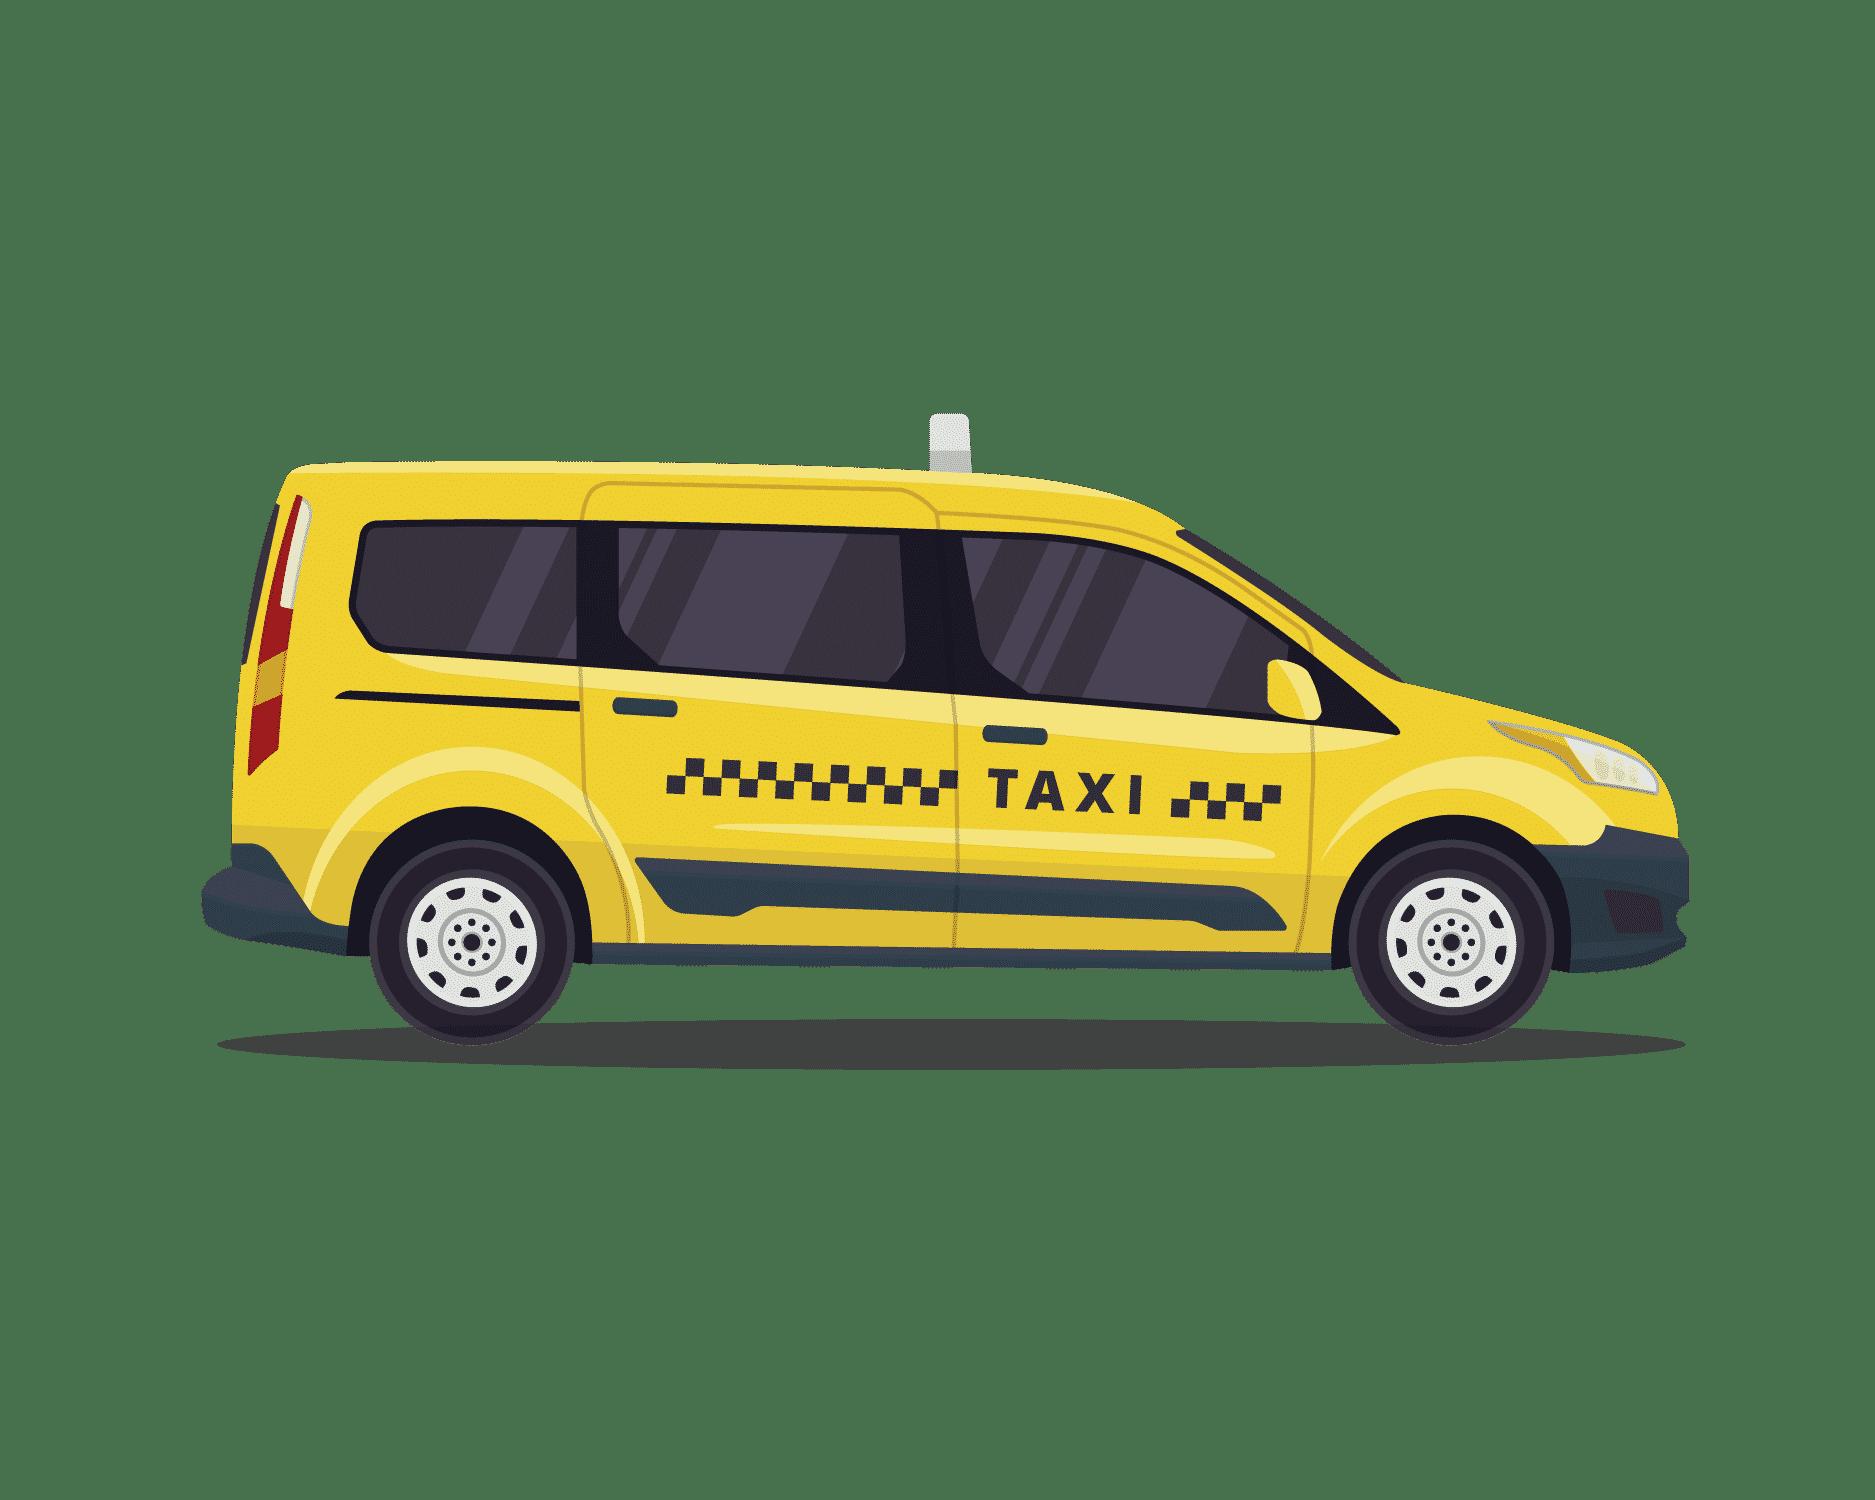 taxi-van-lyon-véhicule2-allo-van-lyon-taxi 69